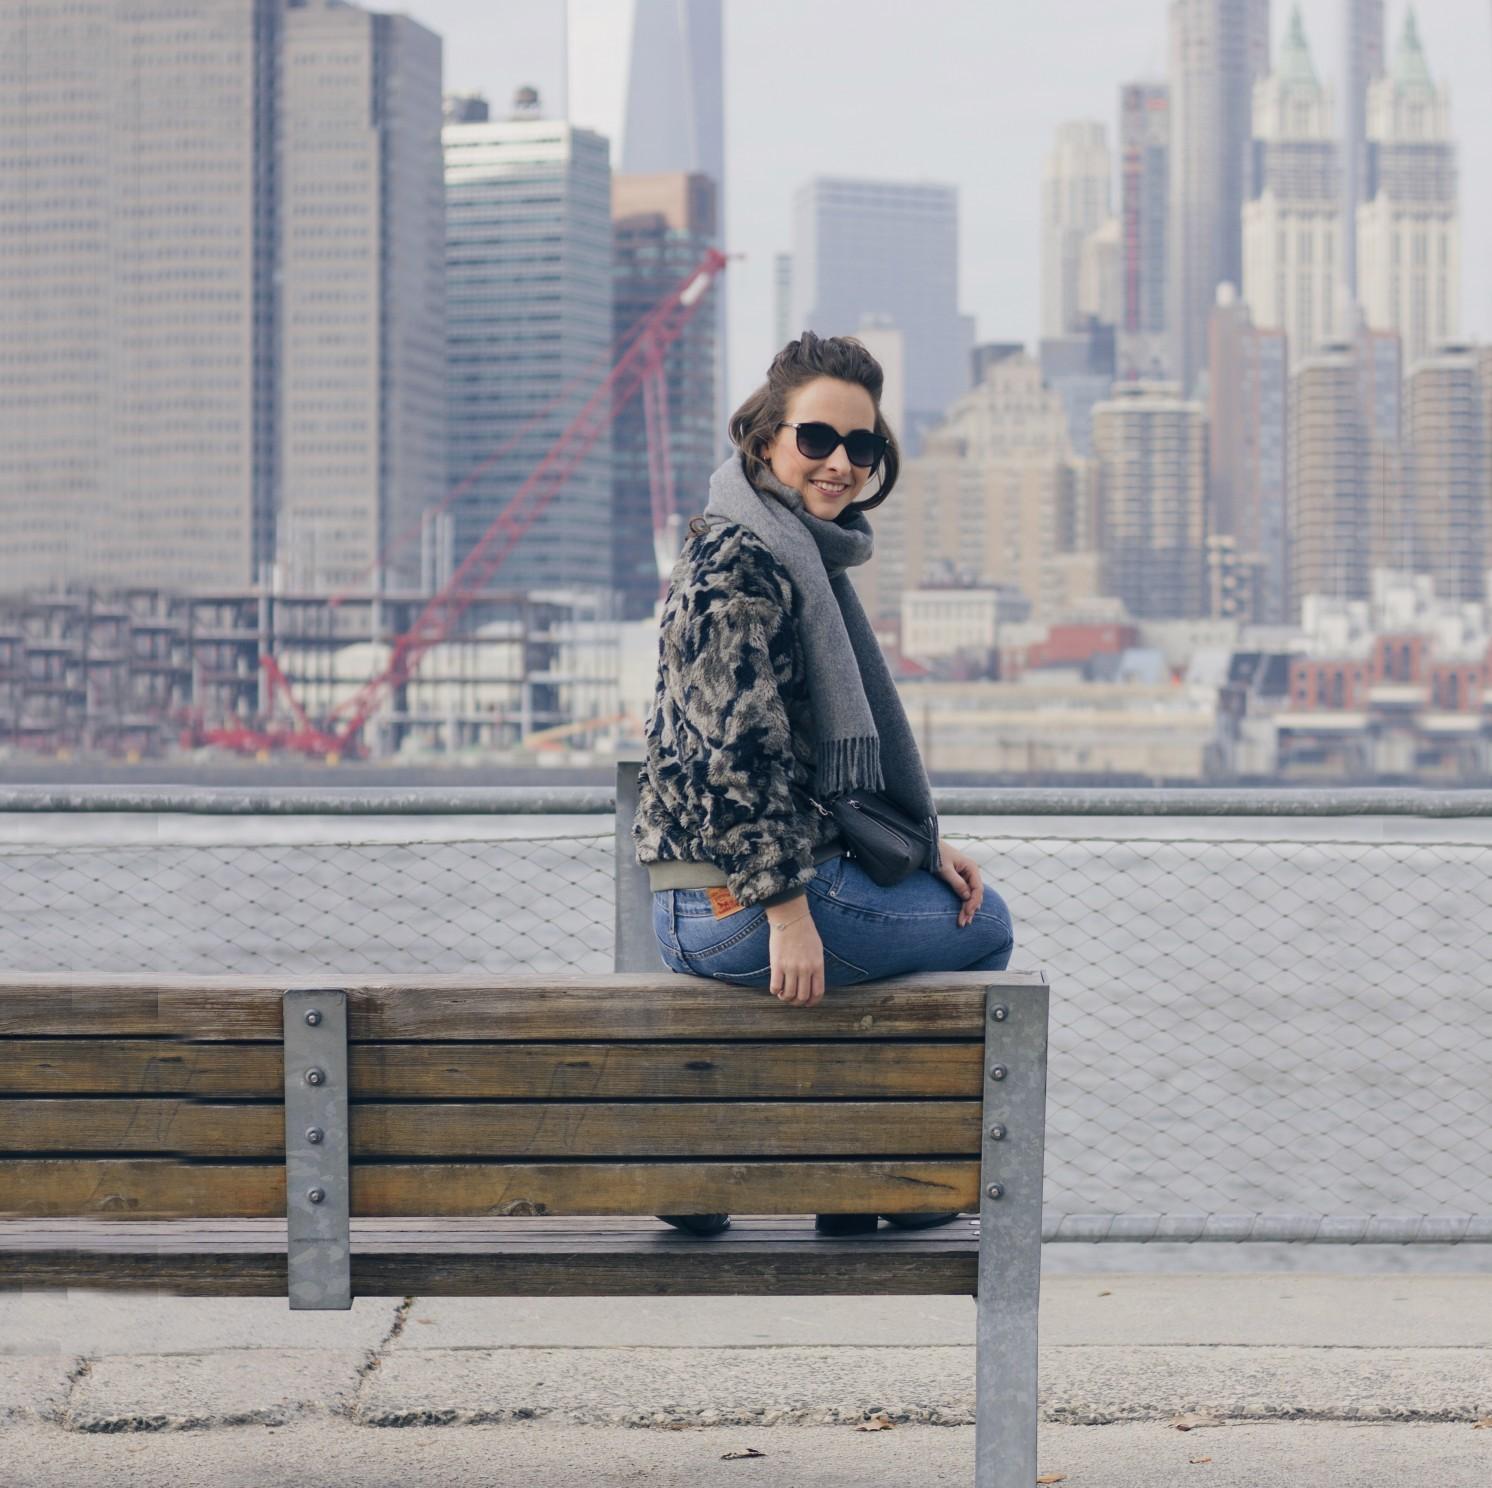 New York shoplog video